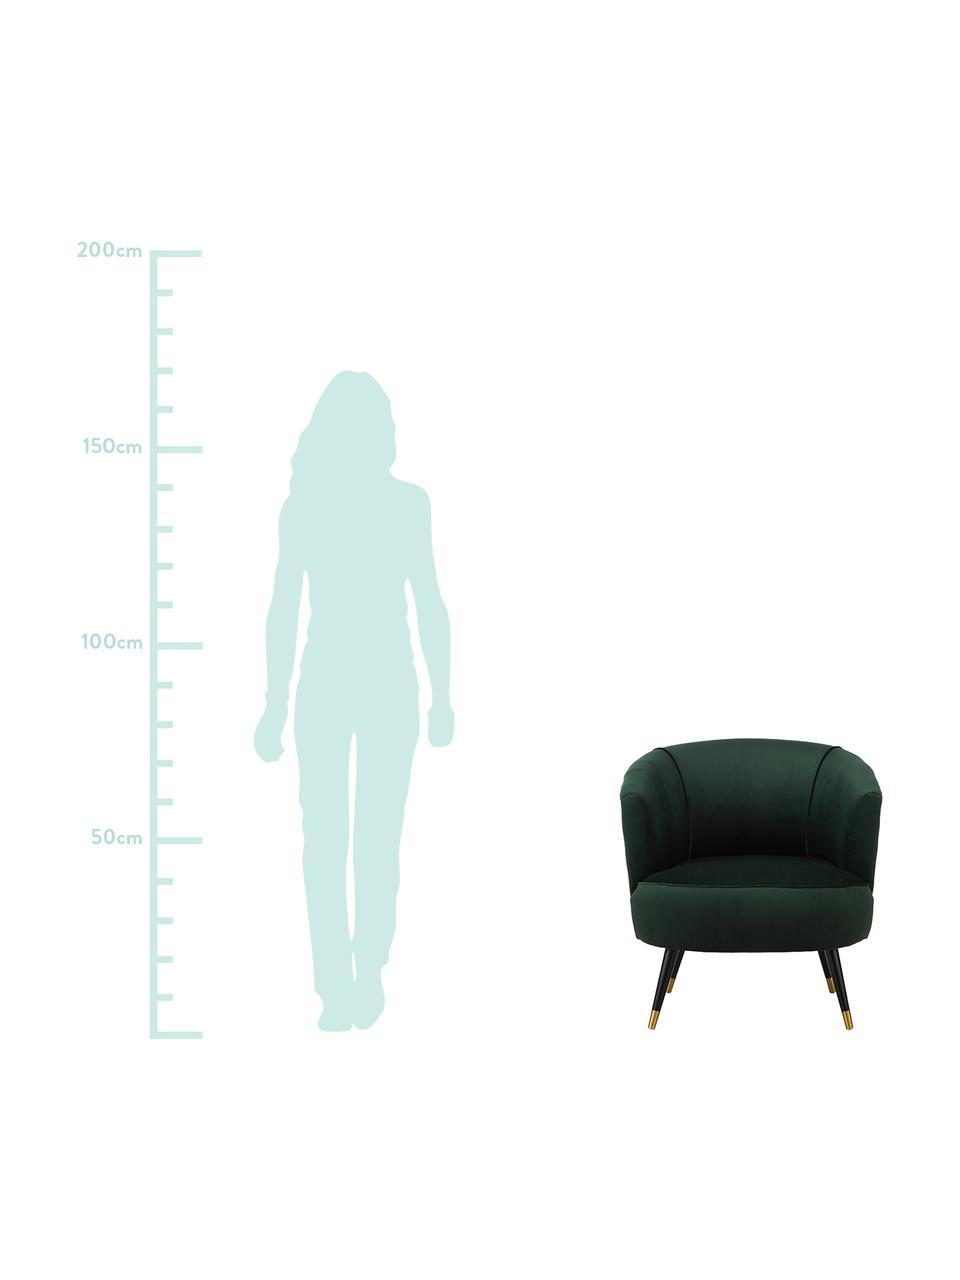 Fluwelen fauteuil Ella in groen, Bekleding: fluweel (polyester), Poten: gelakt metaal, Fluweel donkergroen, B 74 x D 78 cm